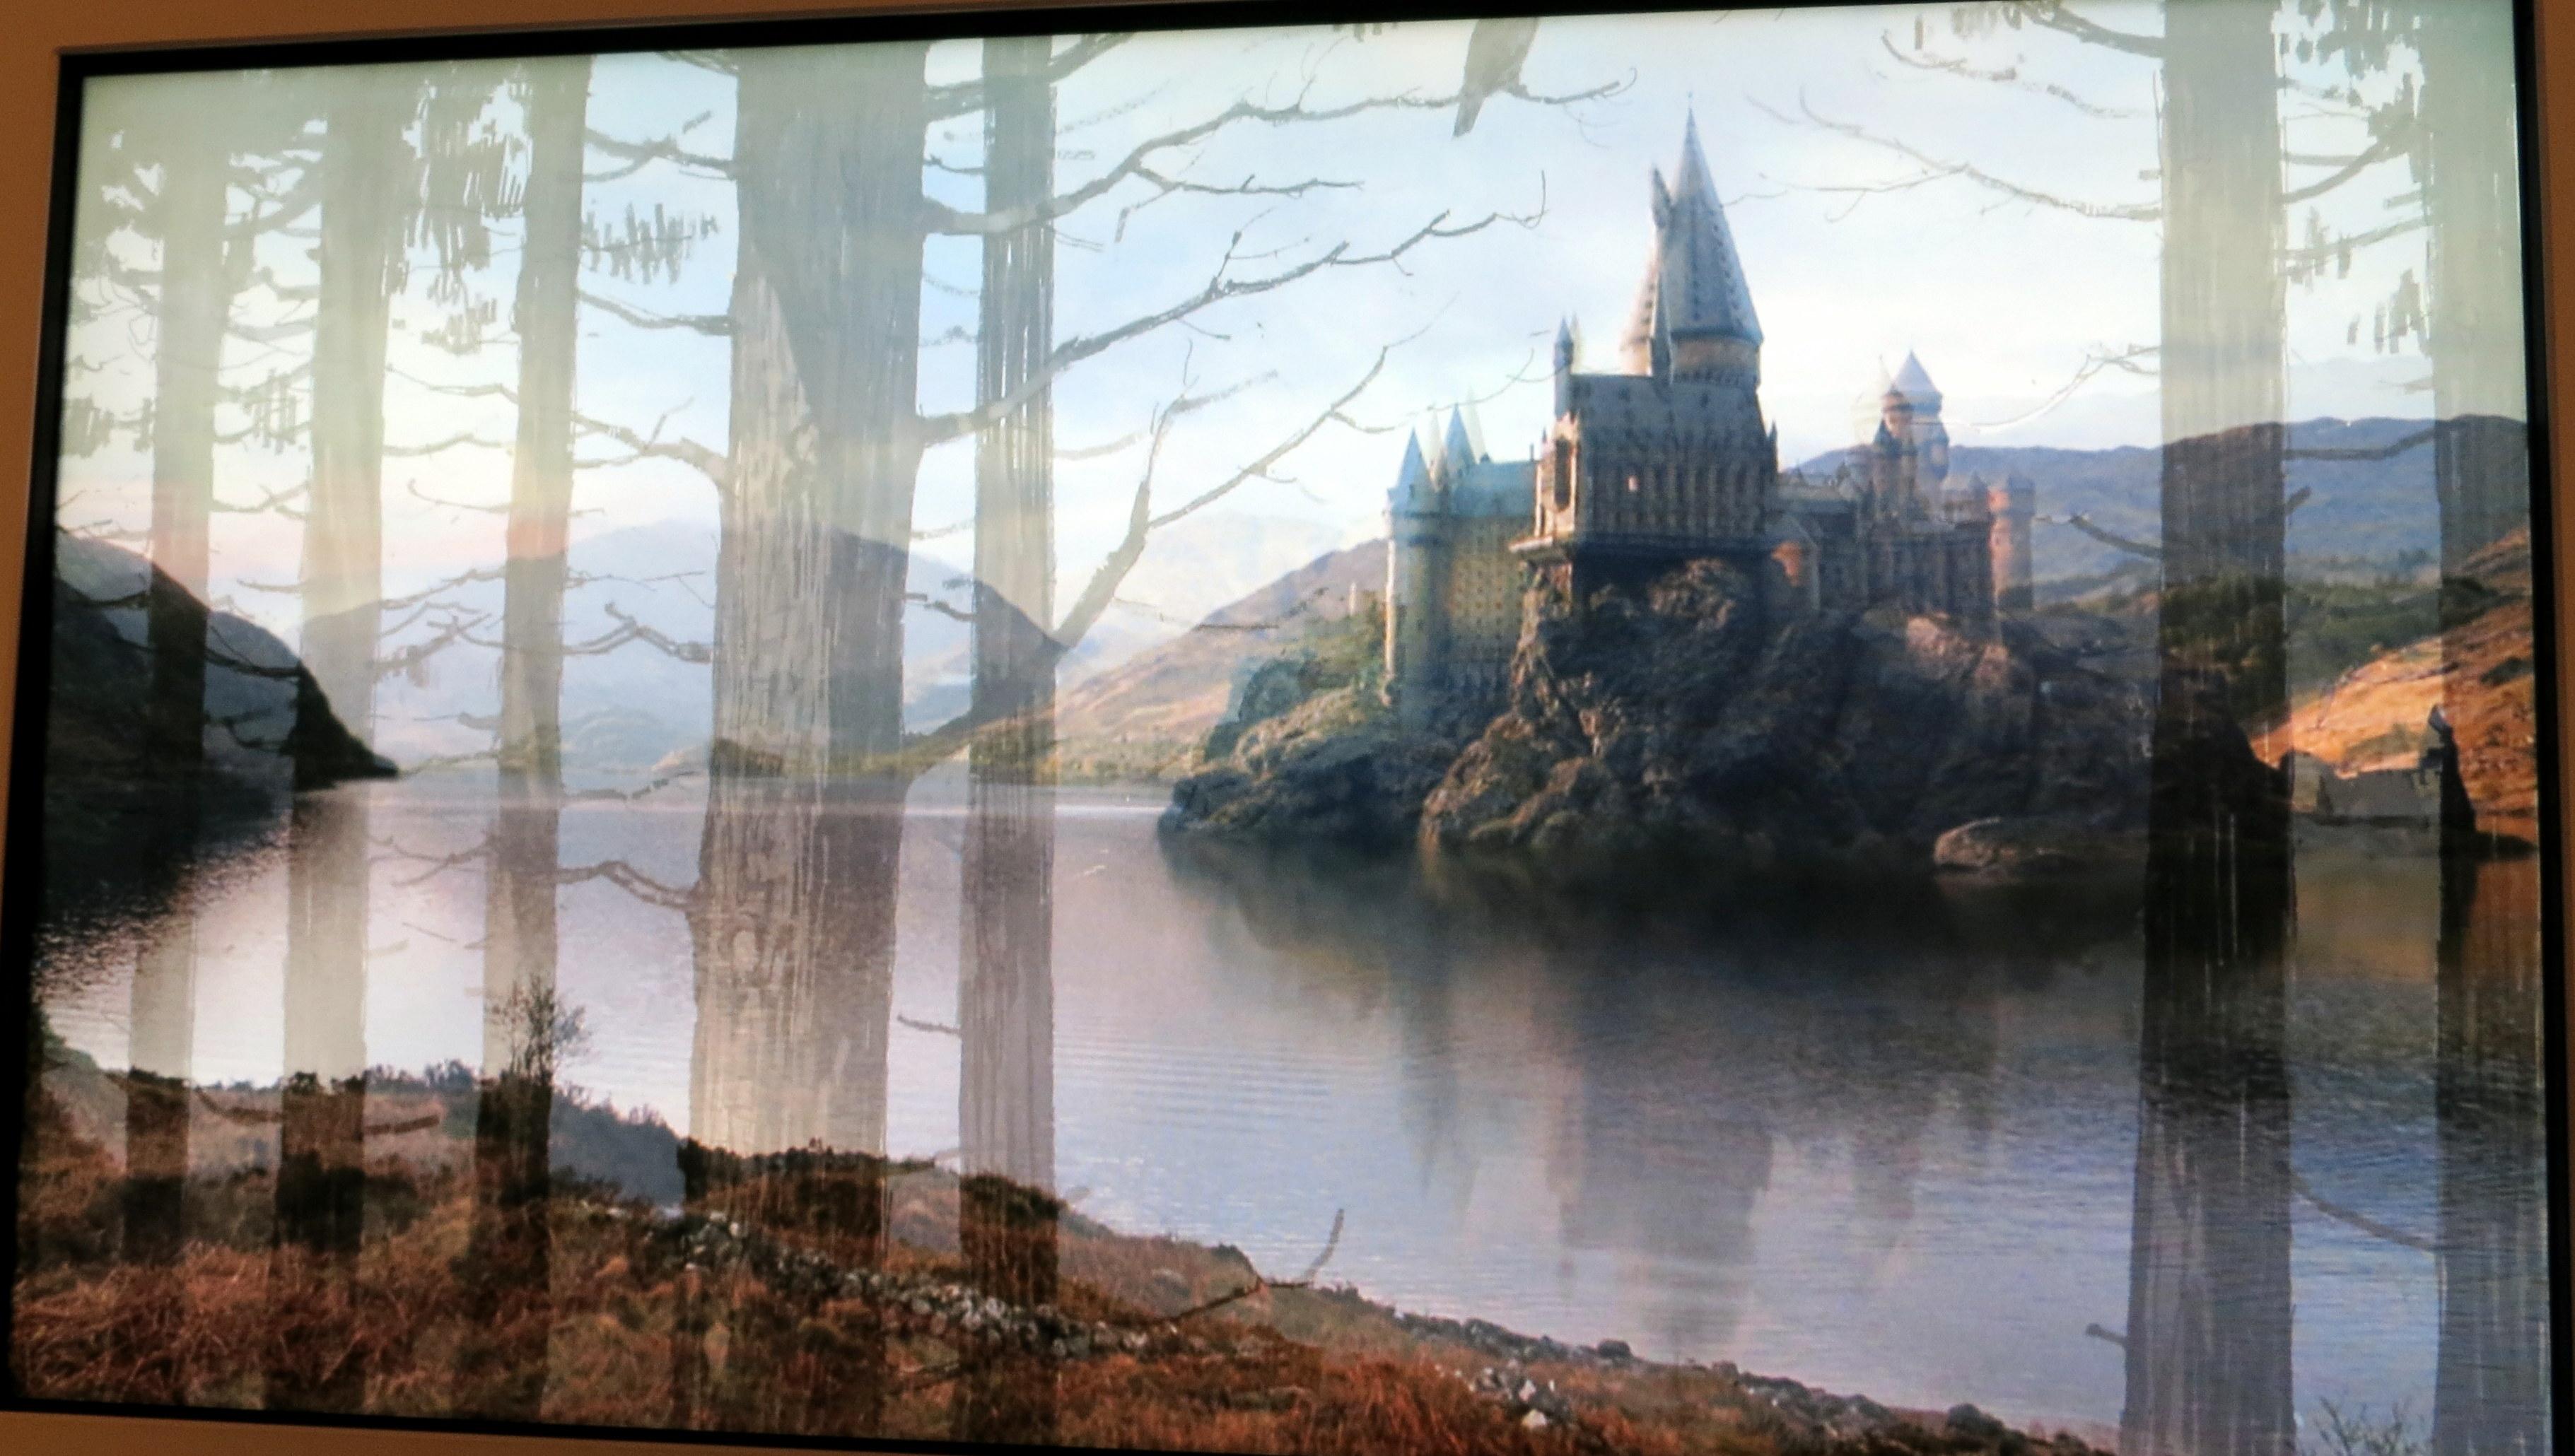 Must see Wallpaper Harry Potter Concept Art - concept_artist_dermot_power_harry_potter_films_wb_by_sceptre63-d8gjeij  Perfect Image Reference_381134.jpg